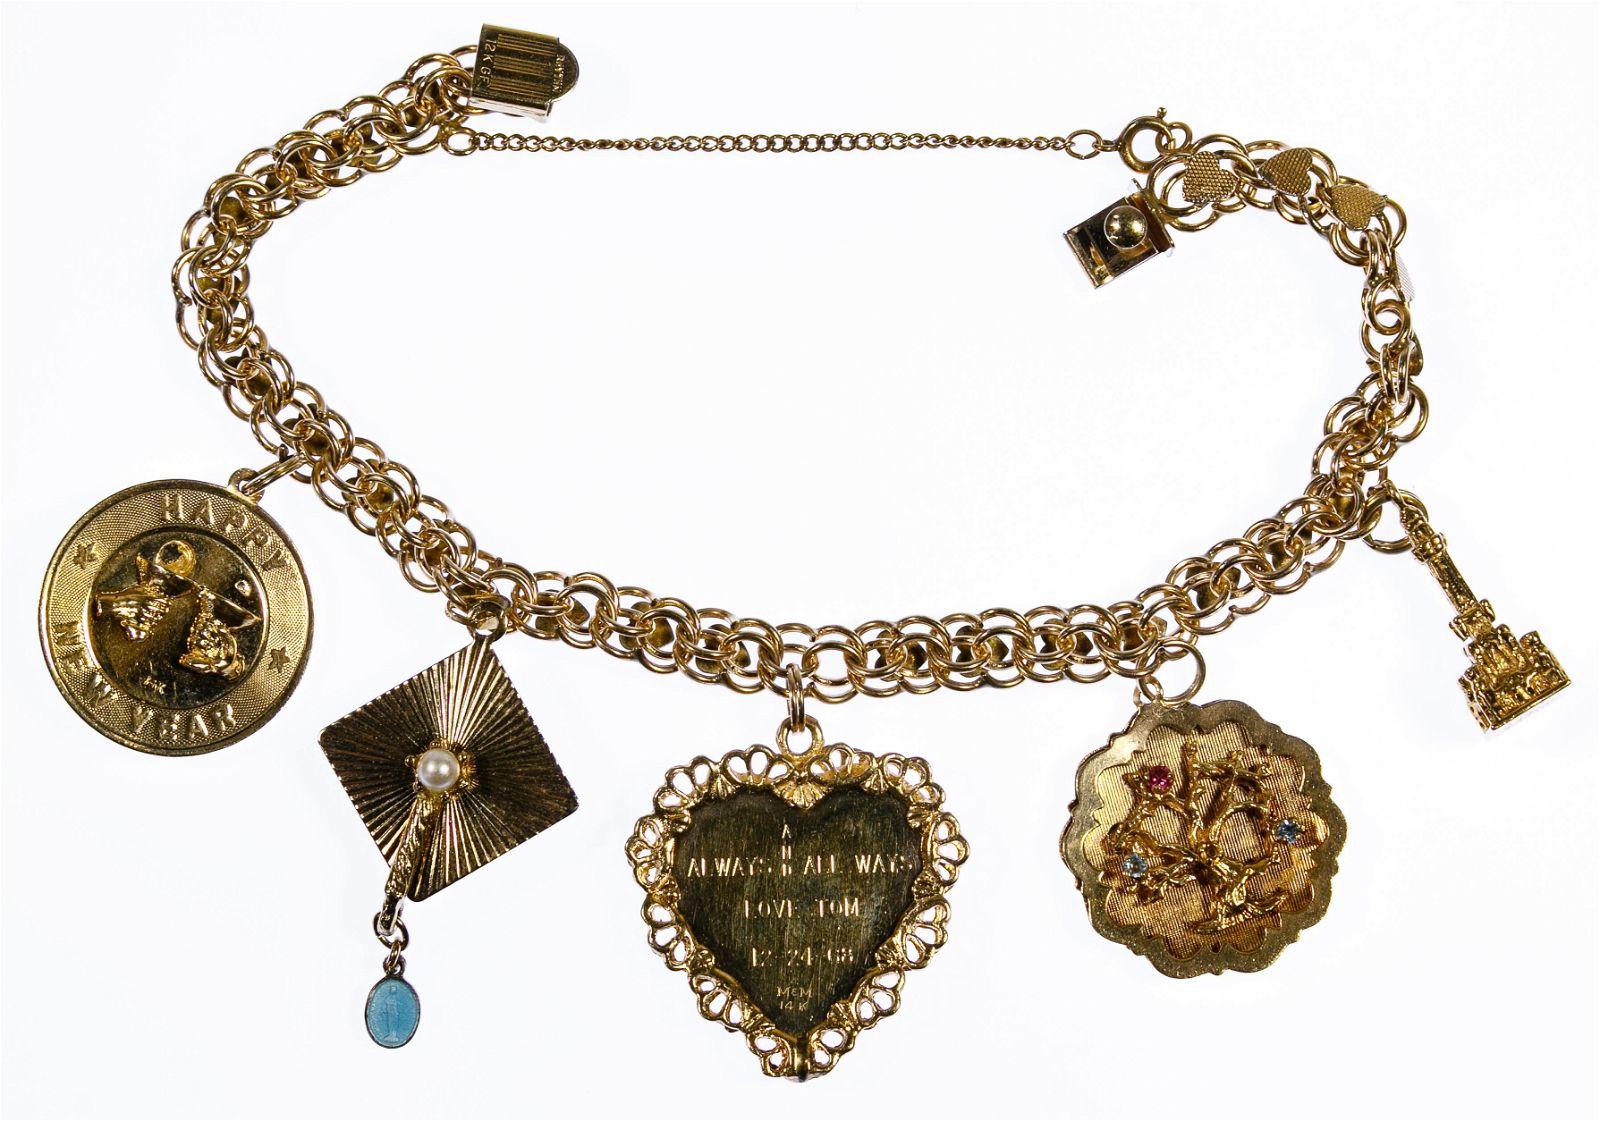 14k Gold Charms on a Gold Filled Bracelet